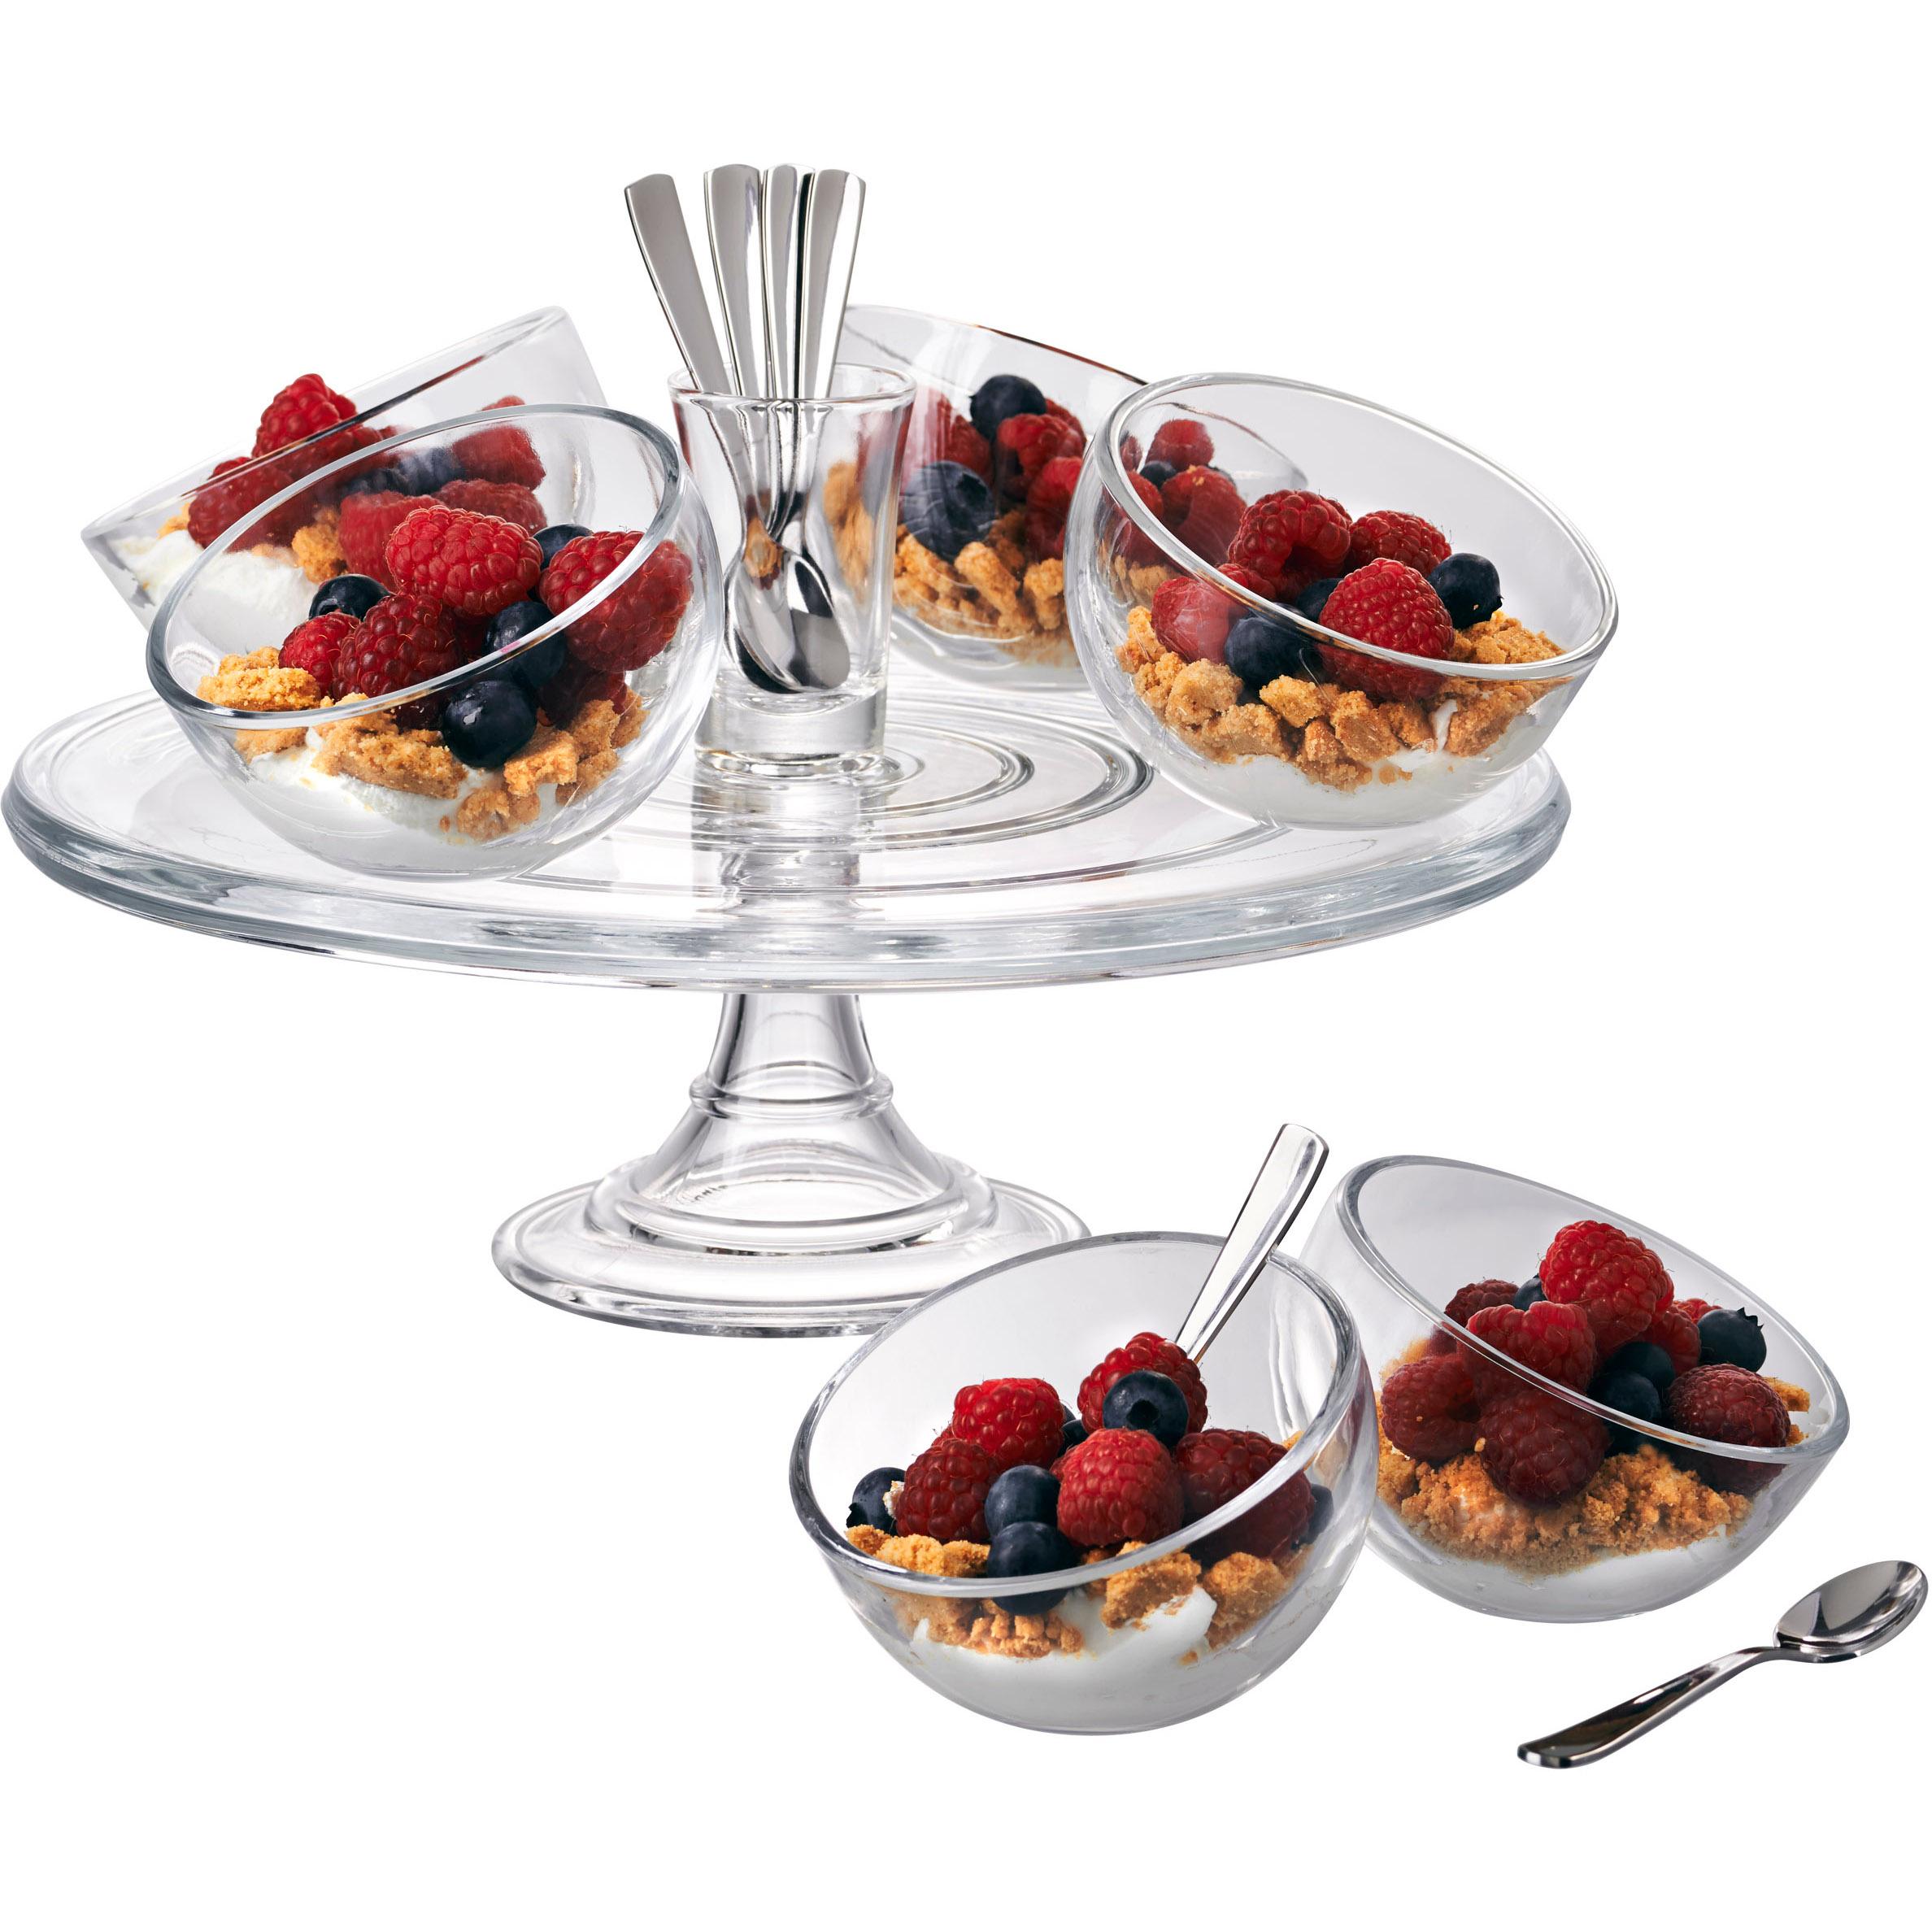 Artland Orbit 15 Piece Glass and Stainless Steel Dessert Set